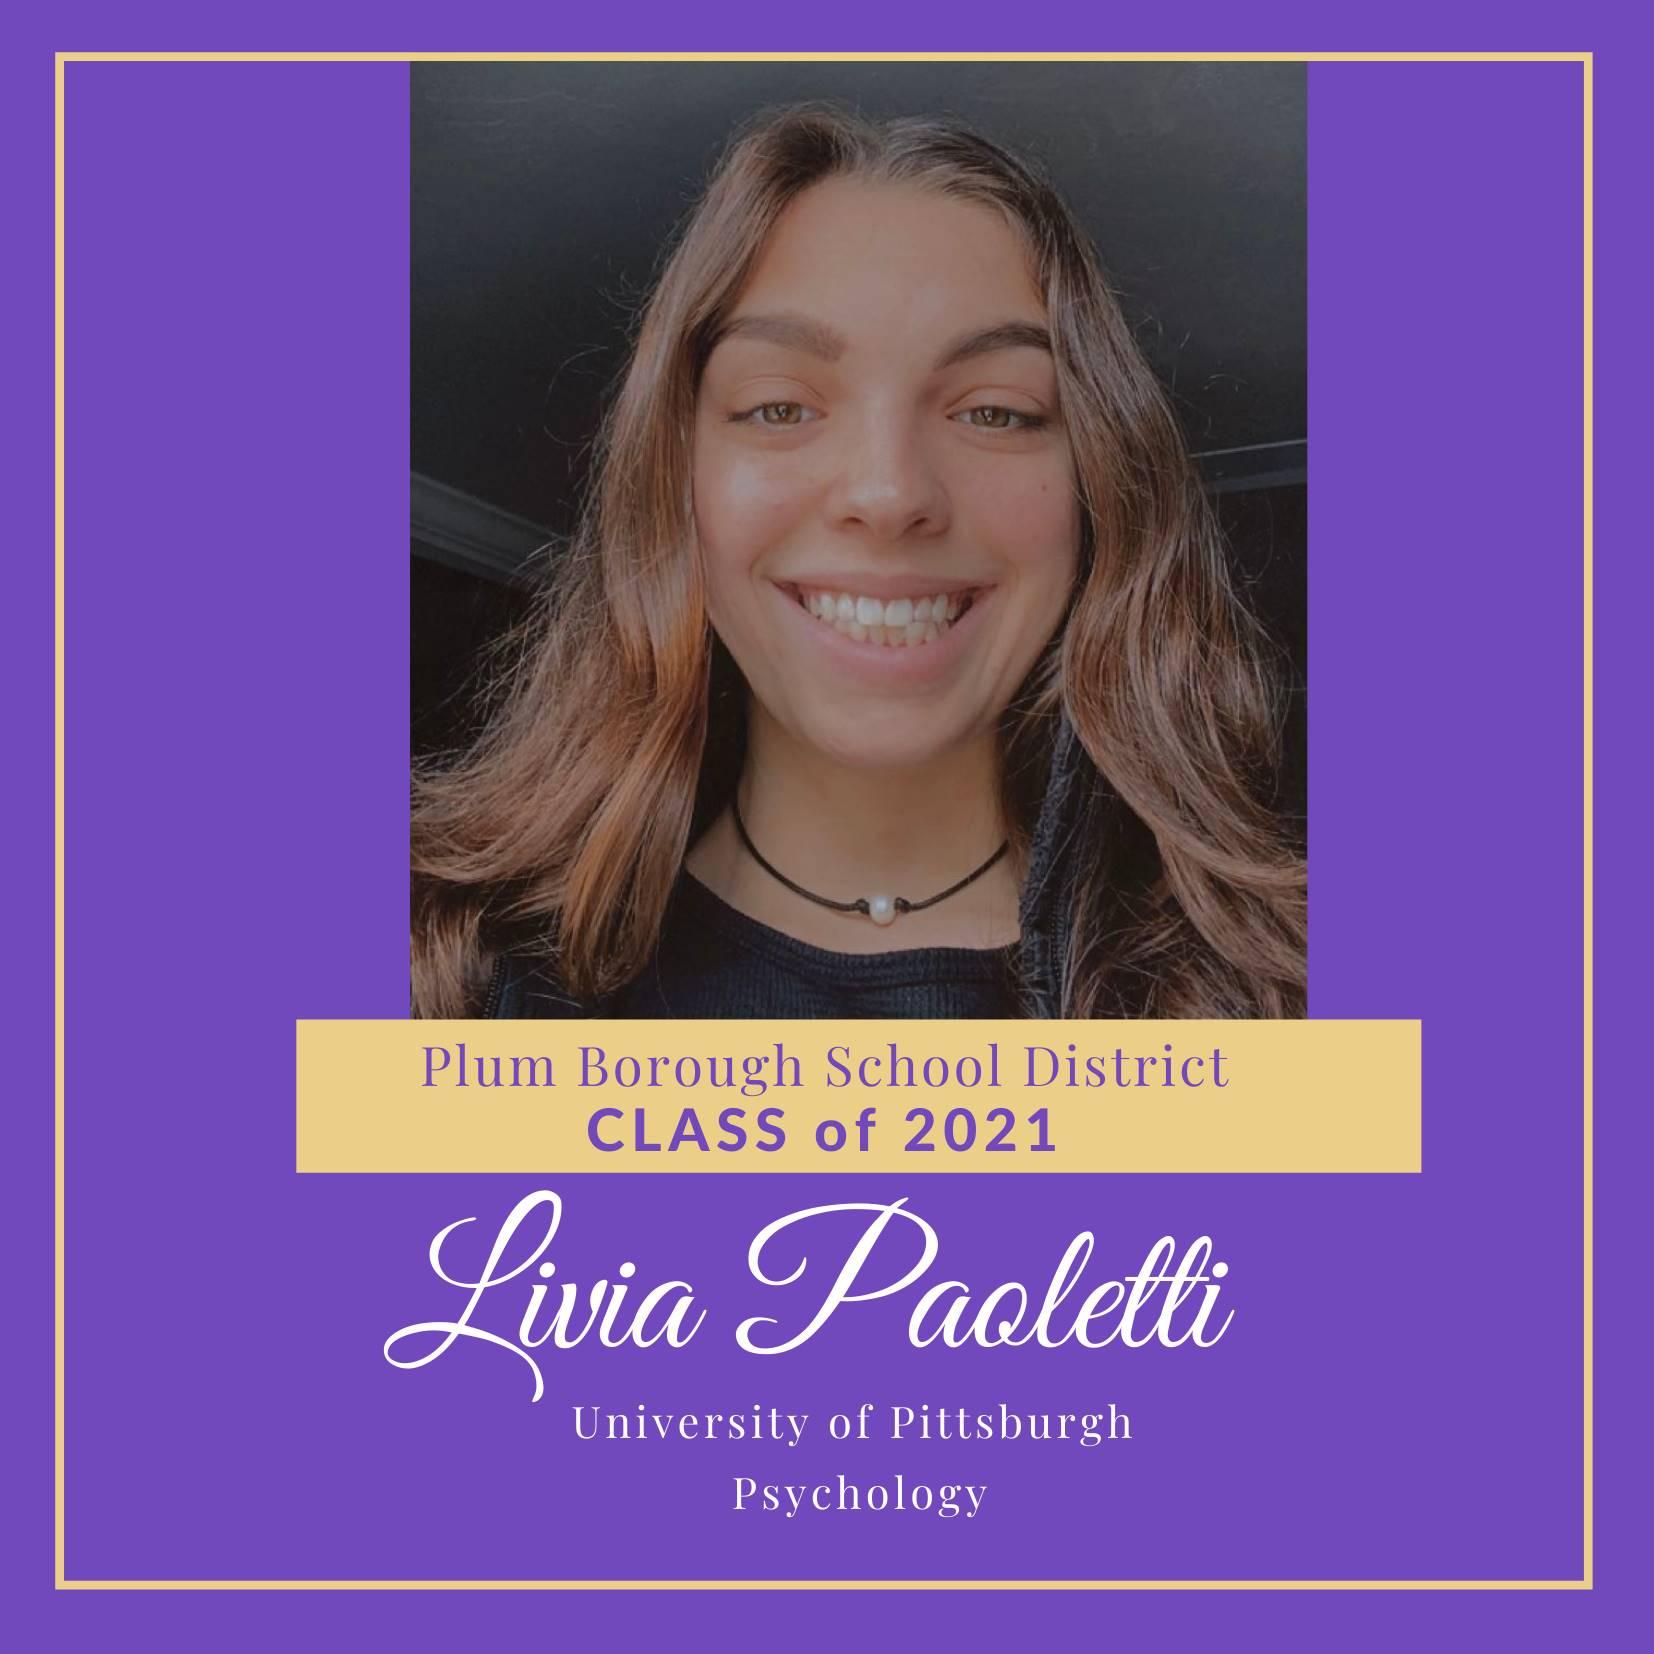 Congratulations to Livia Paoletti, Class of 2021!